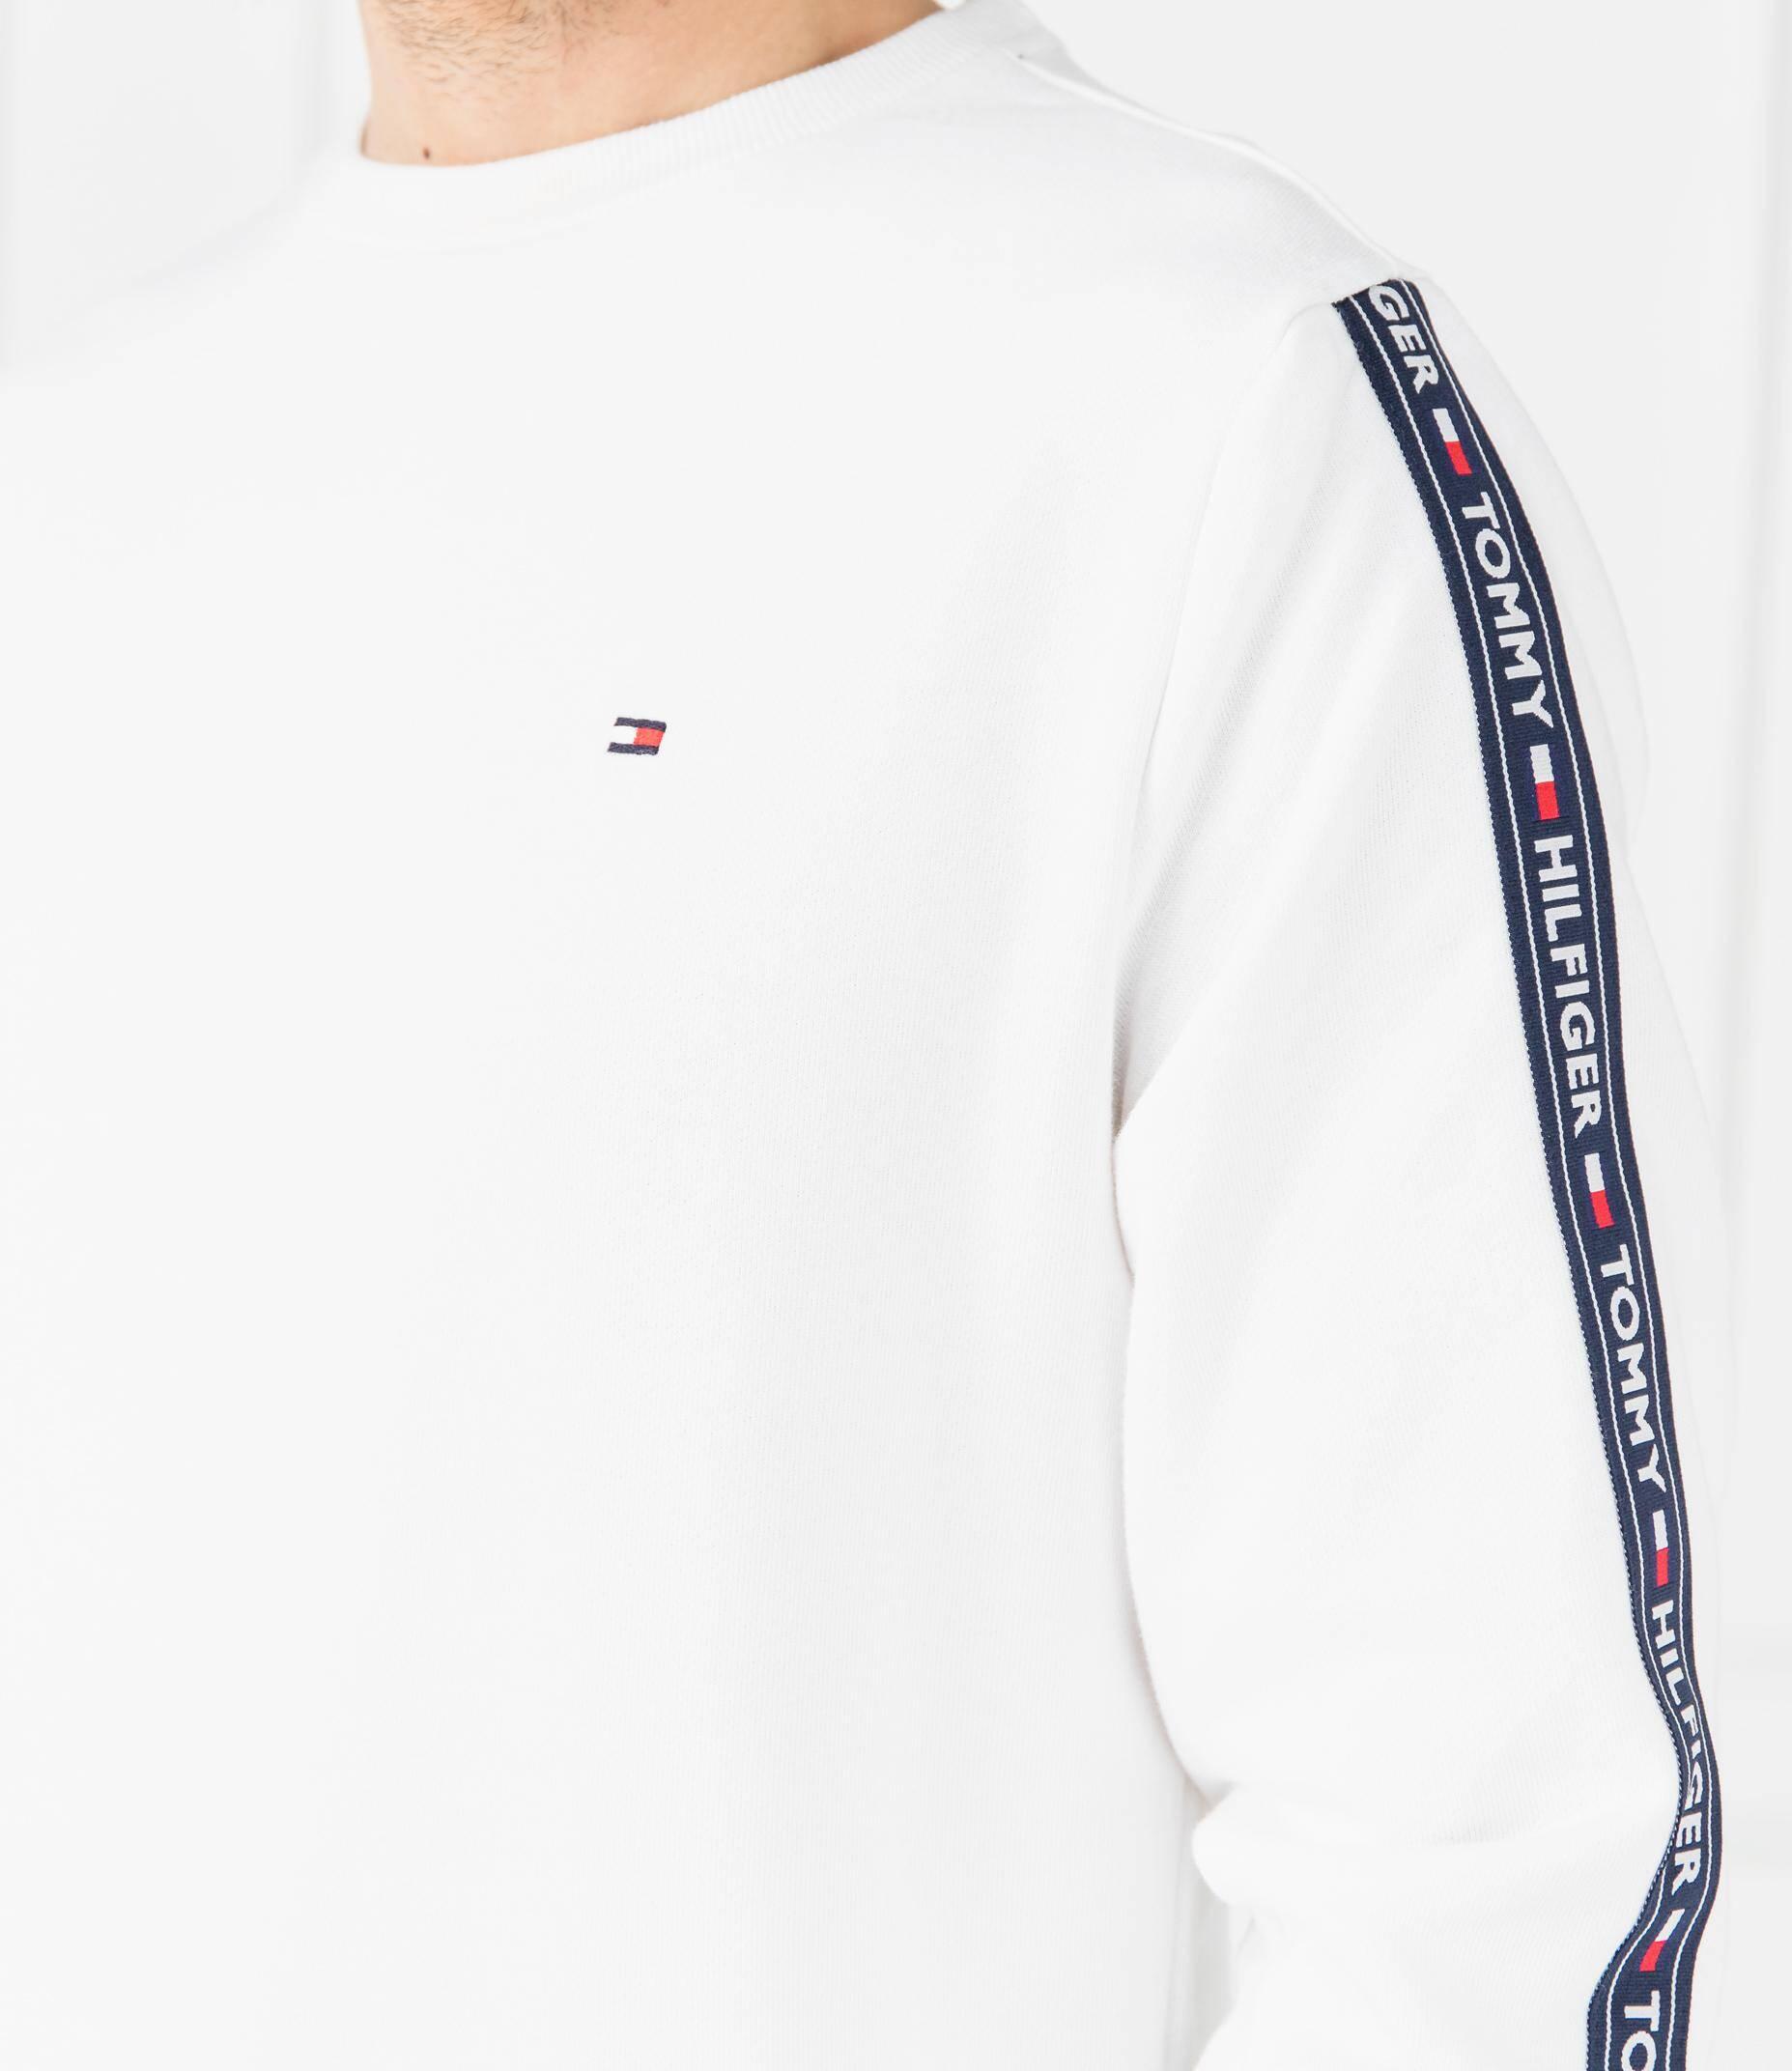 Sweatshirt TRACK TOP LS HWK | Relaxed fit